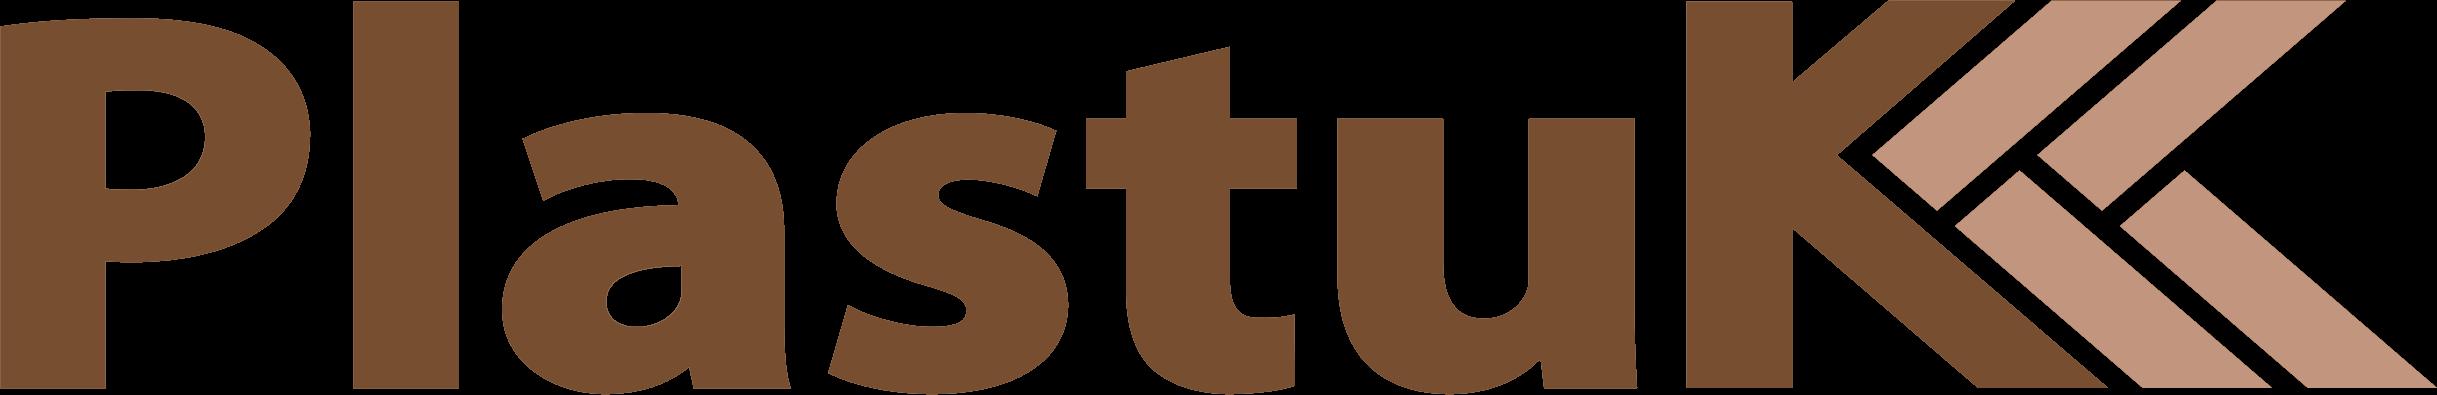 plastuk_logo